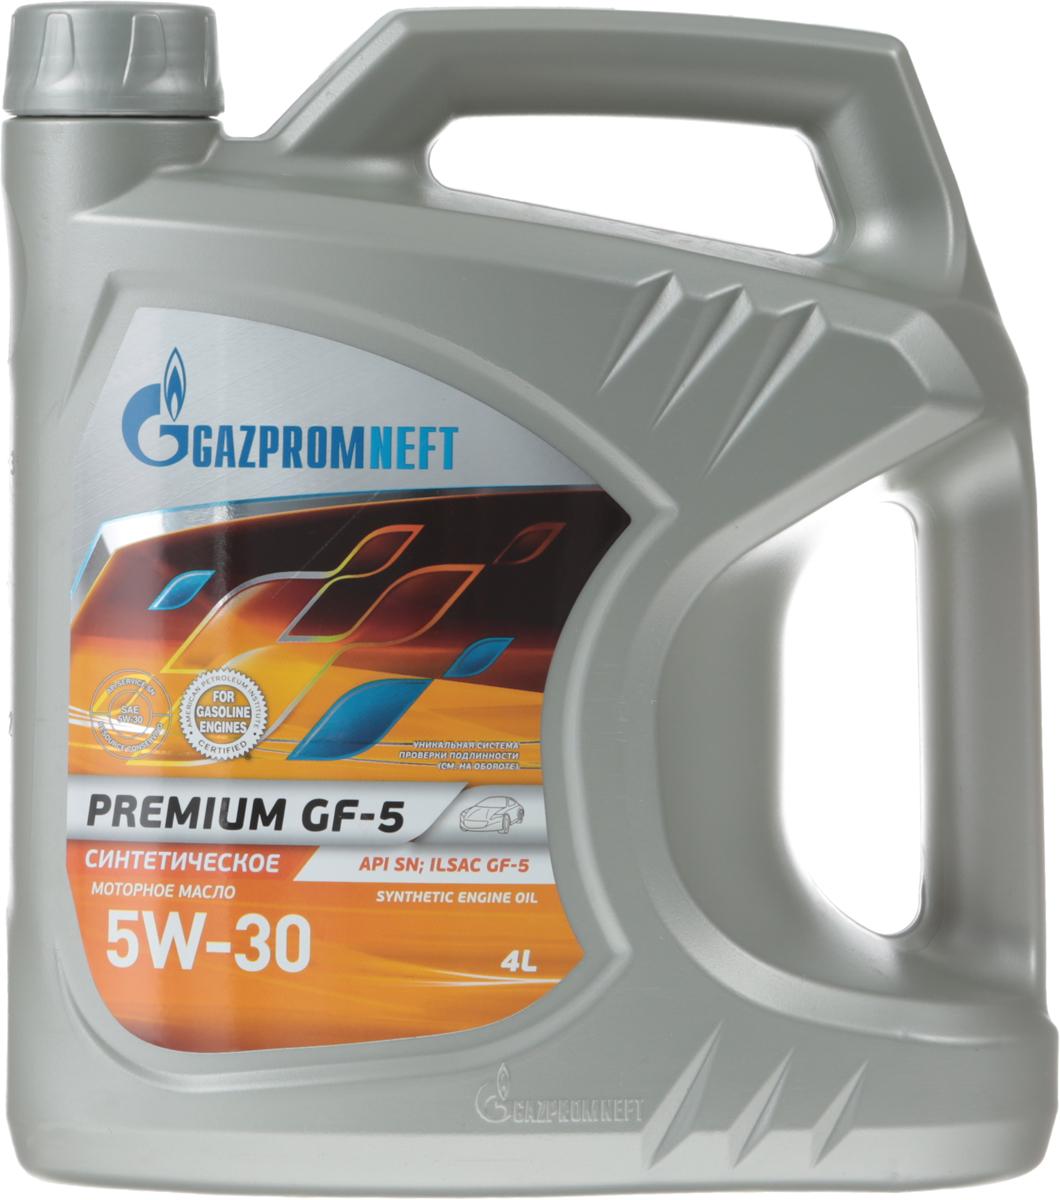 Масло моторное Gazpromneft Premium GF-5 5W-30 API SN, ILSAC GF-5, синтетическое, 4 л